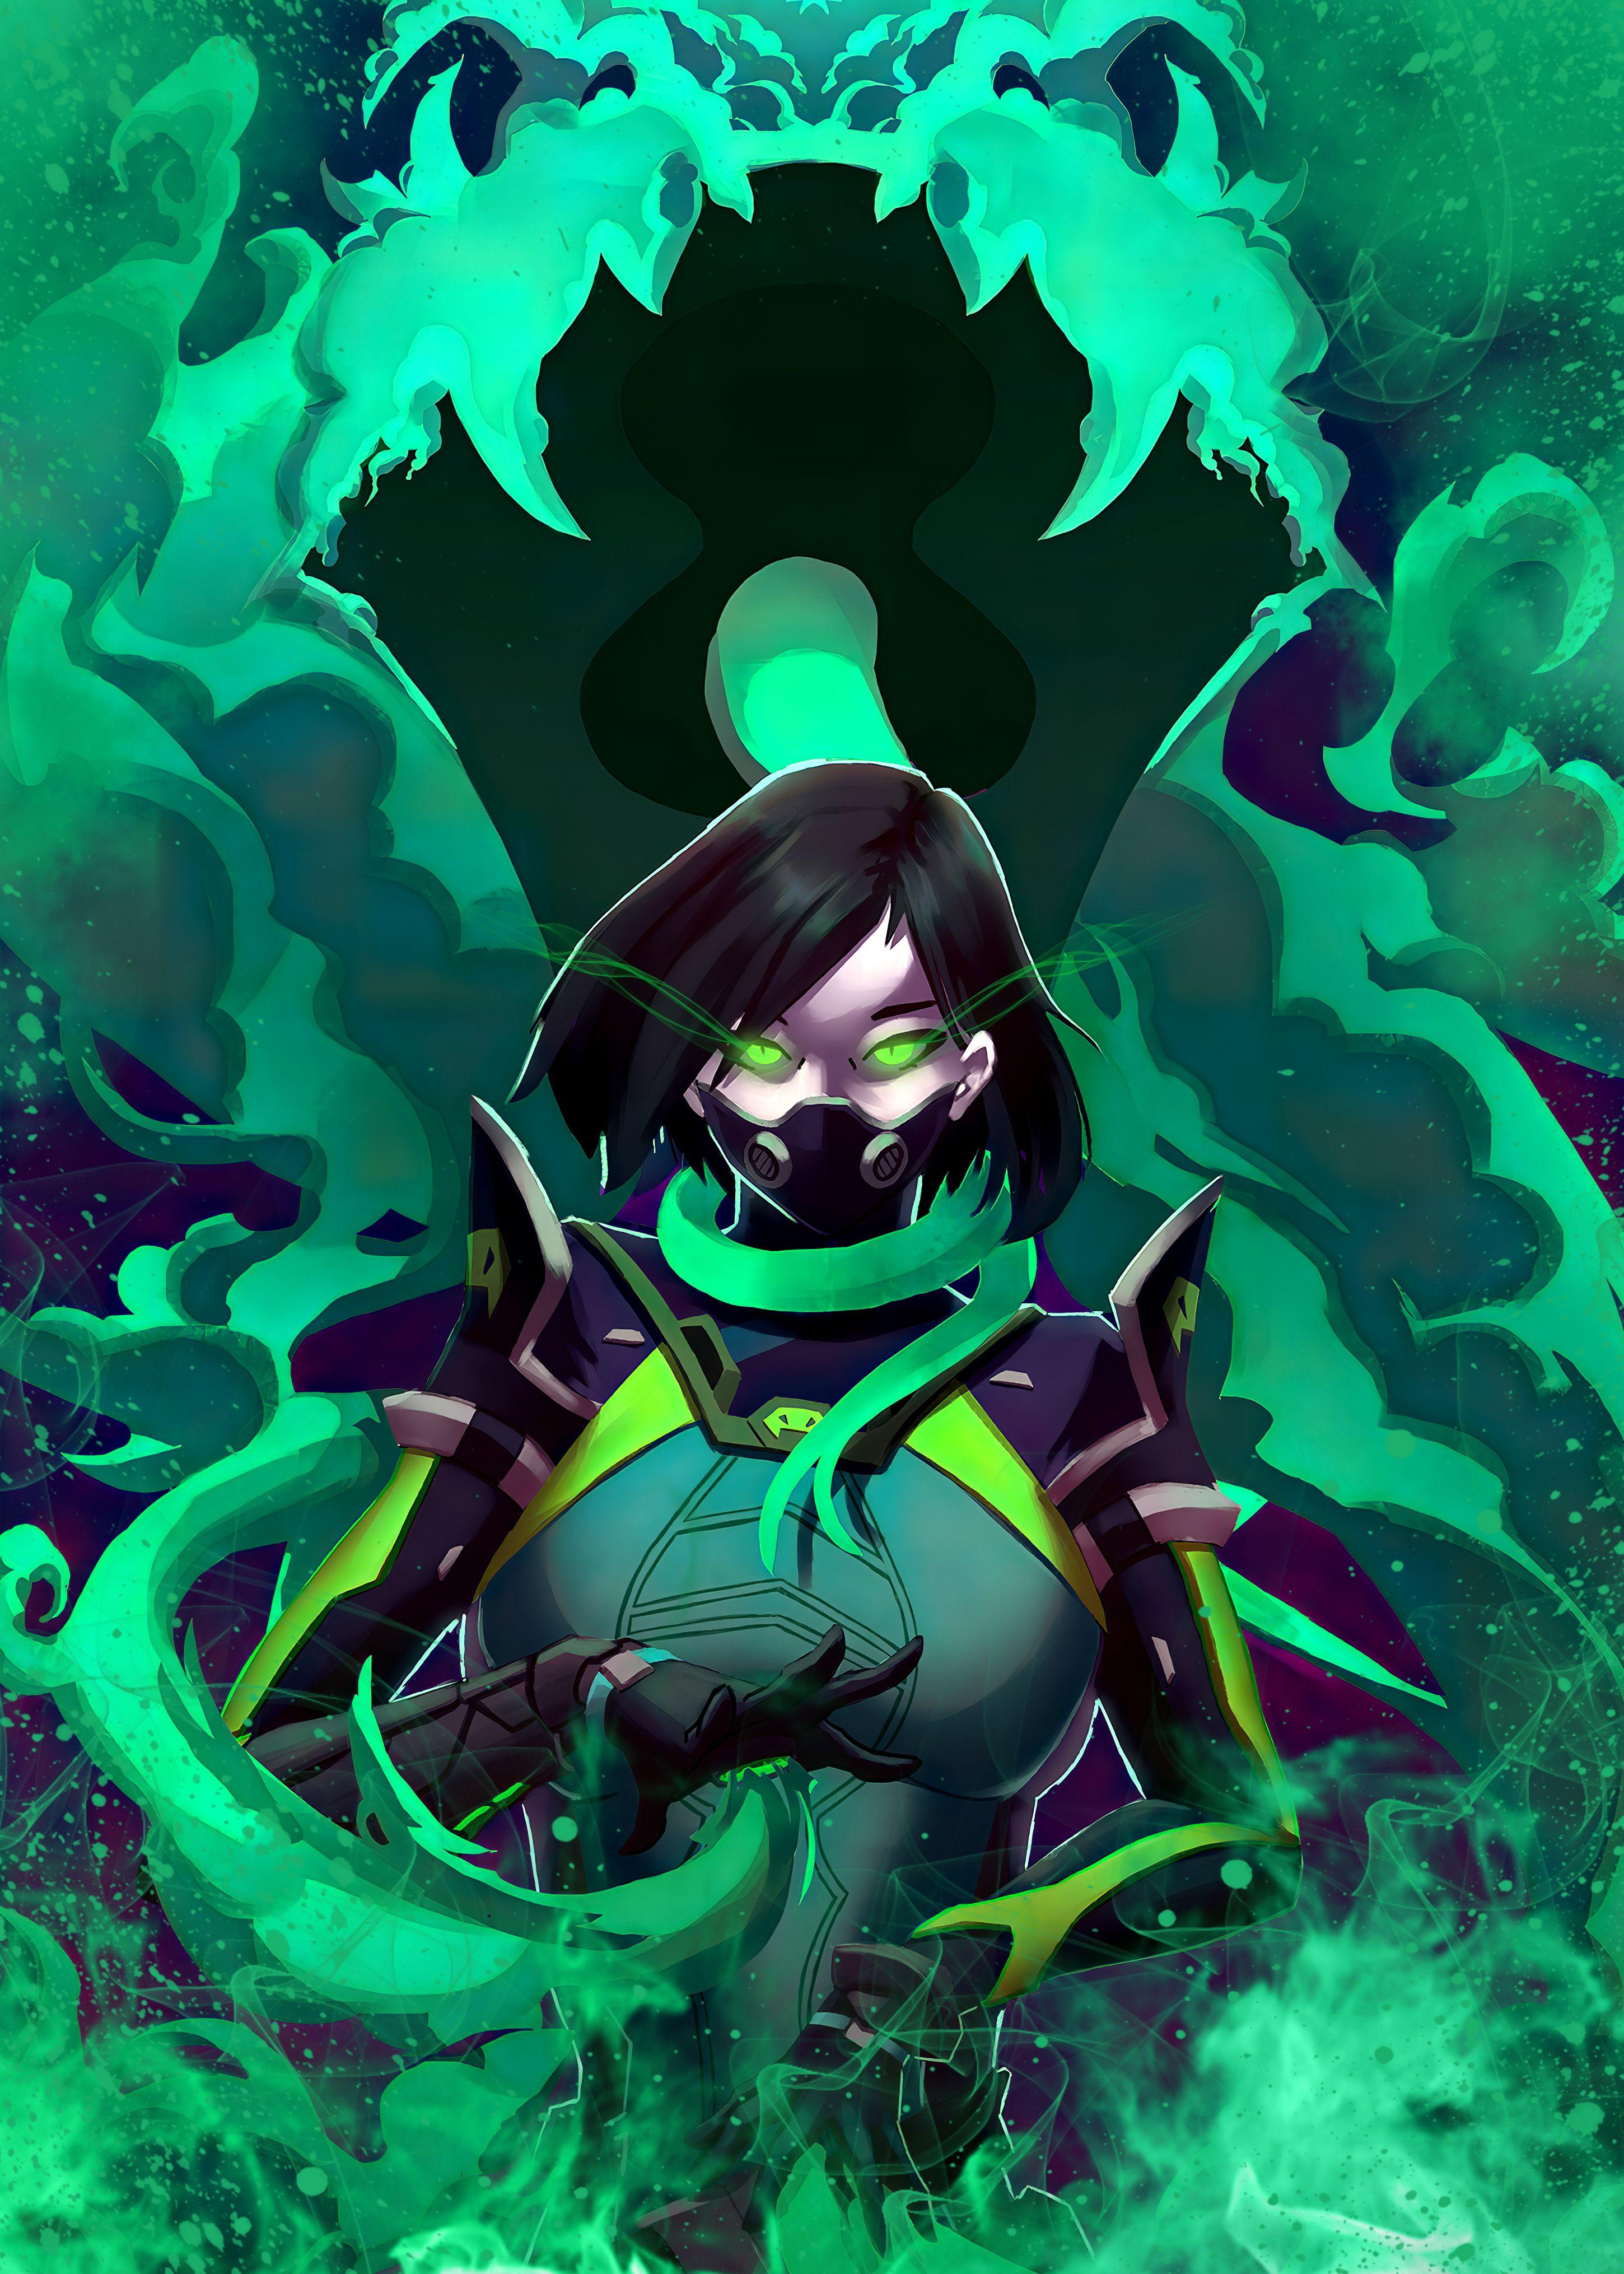 39 Viper Valorant Metal Poster Character Art Fantasy Character Design Anime Art Girl Viper valorant 4k fan art wallpaper